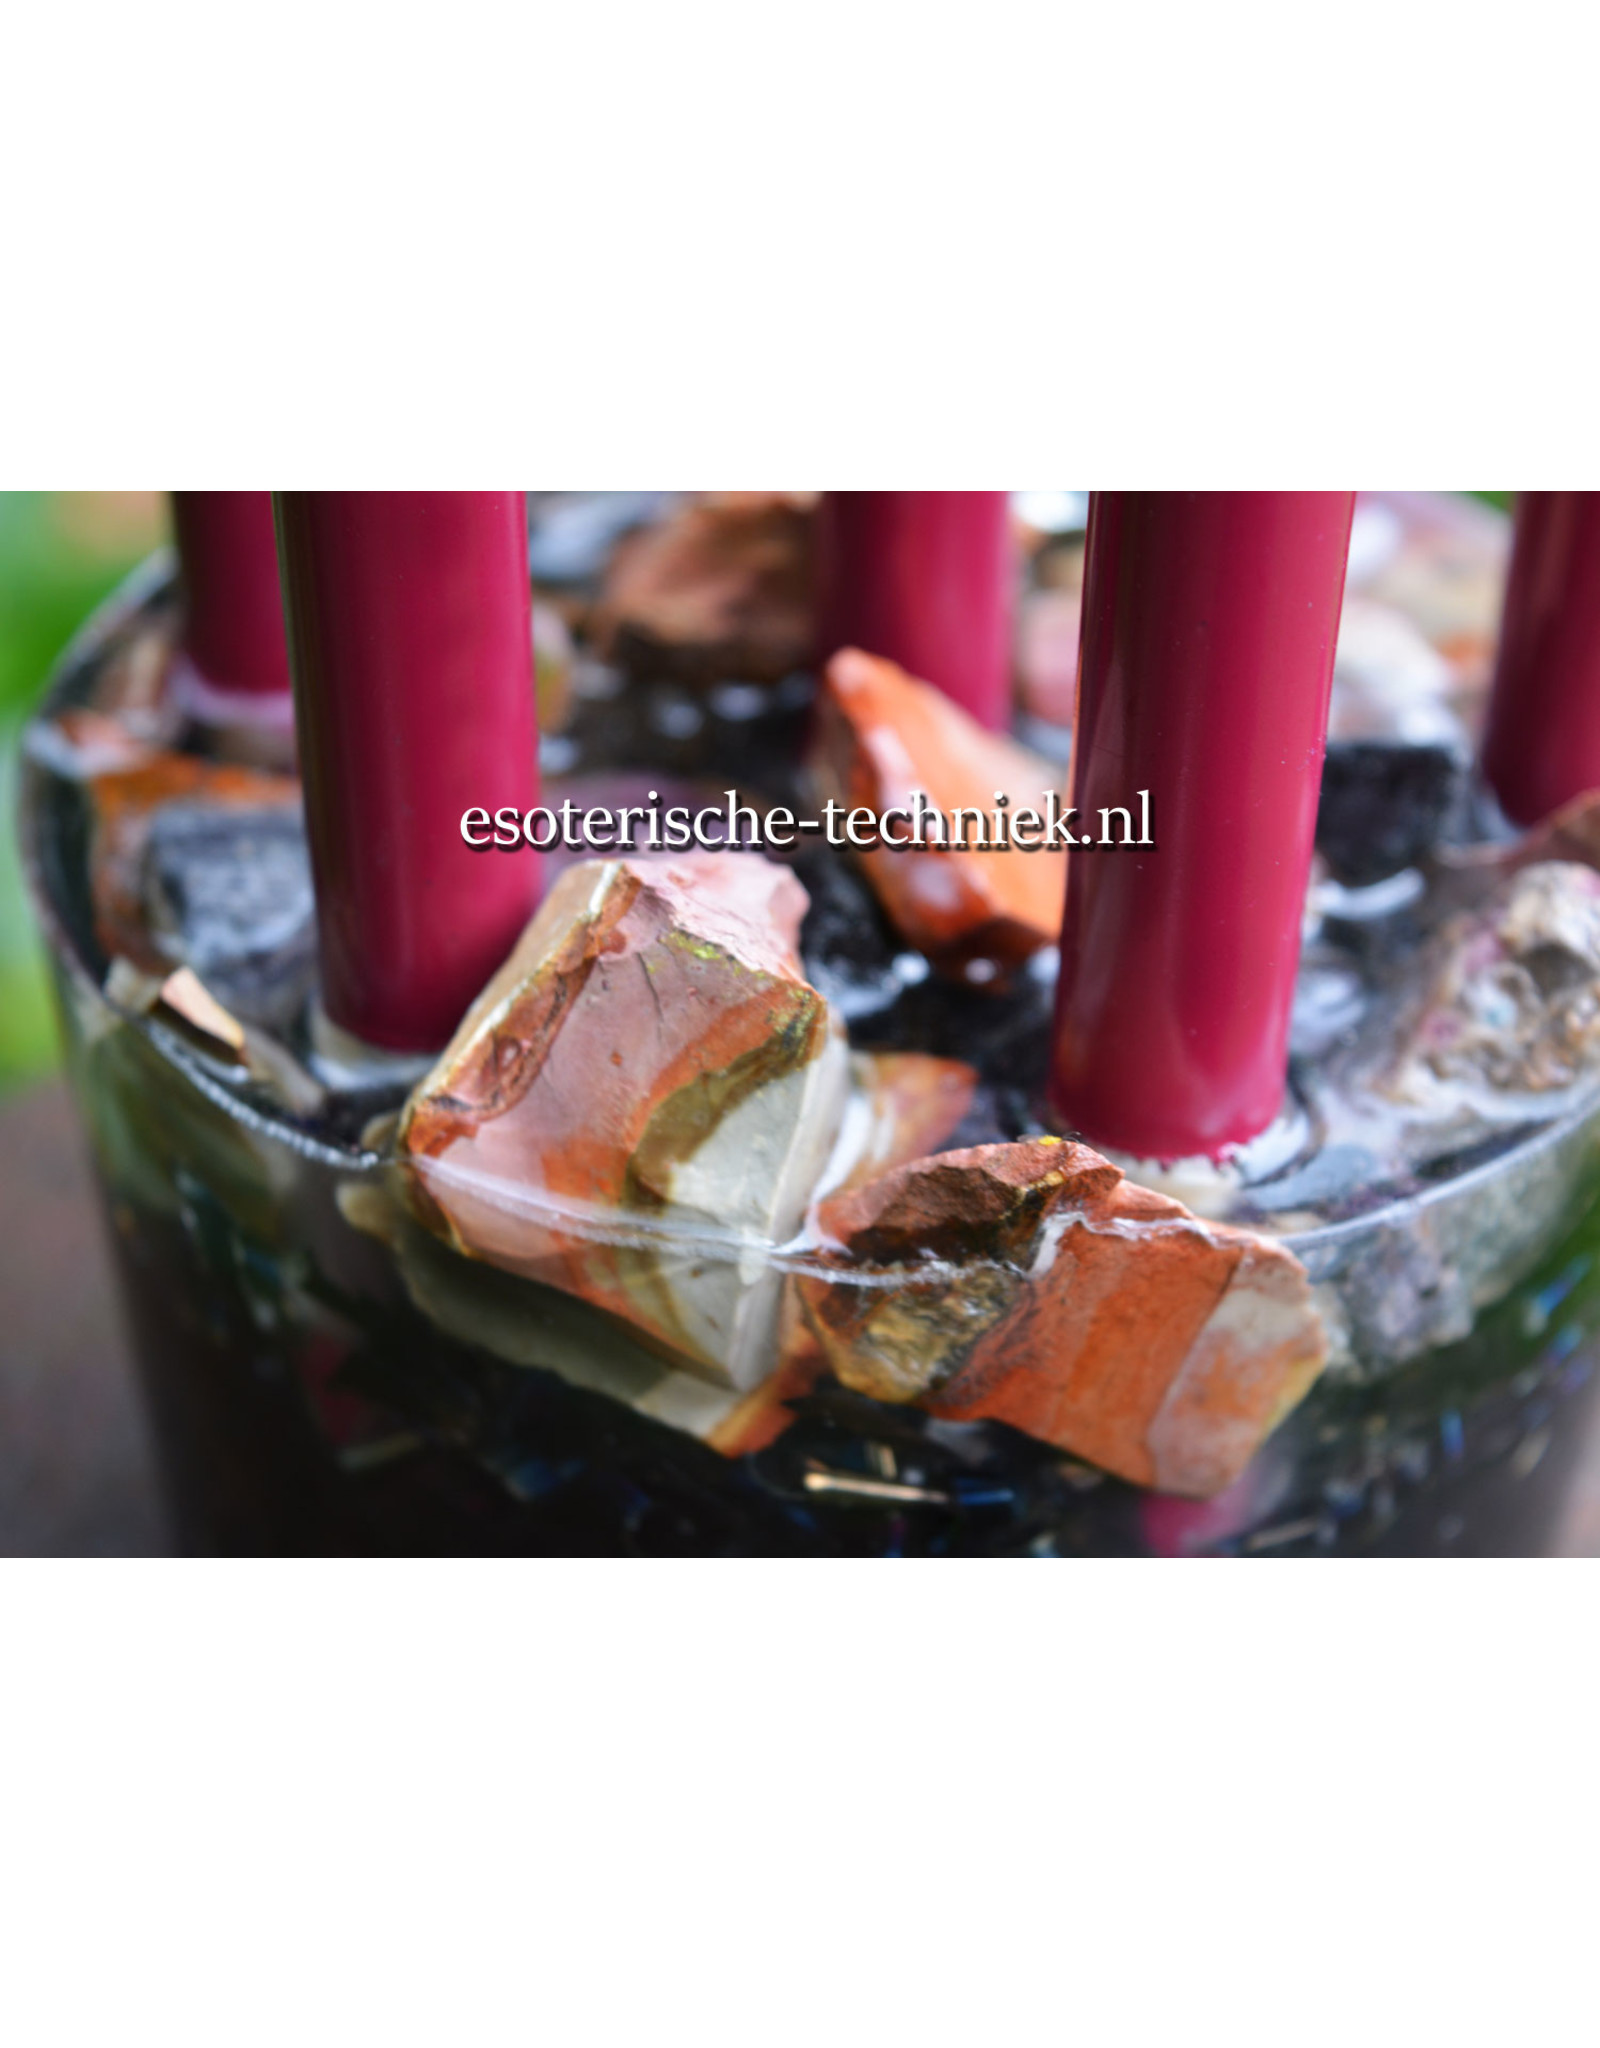 Orgone Chembuster met Shungite,  Toermalijn, Polychroom Jaspis en Bergkristal bol